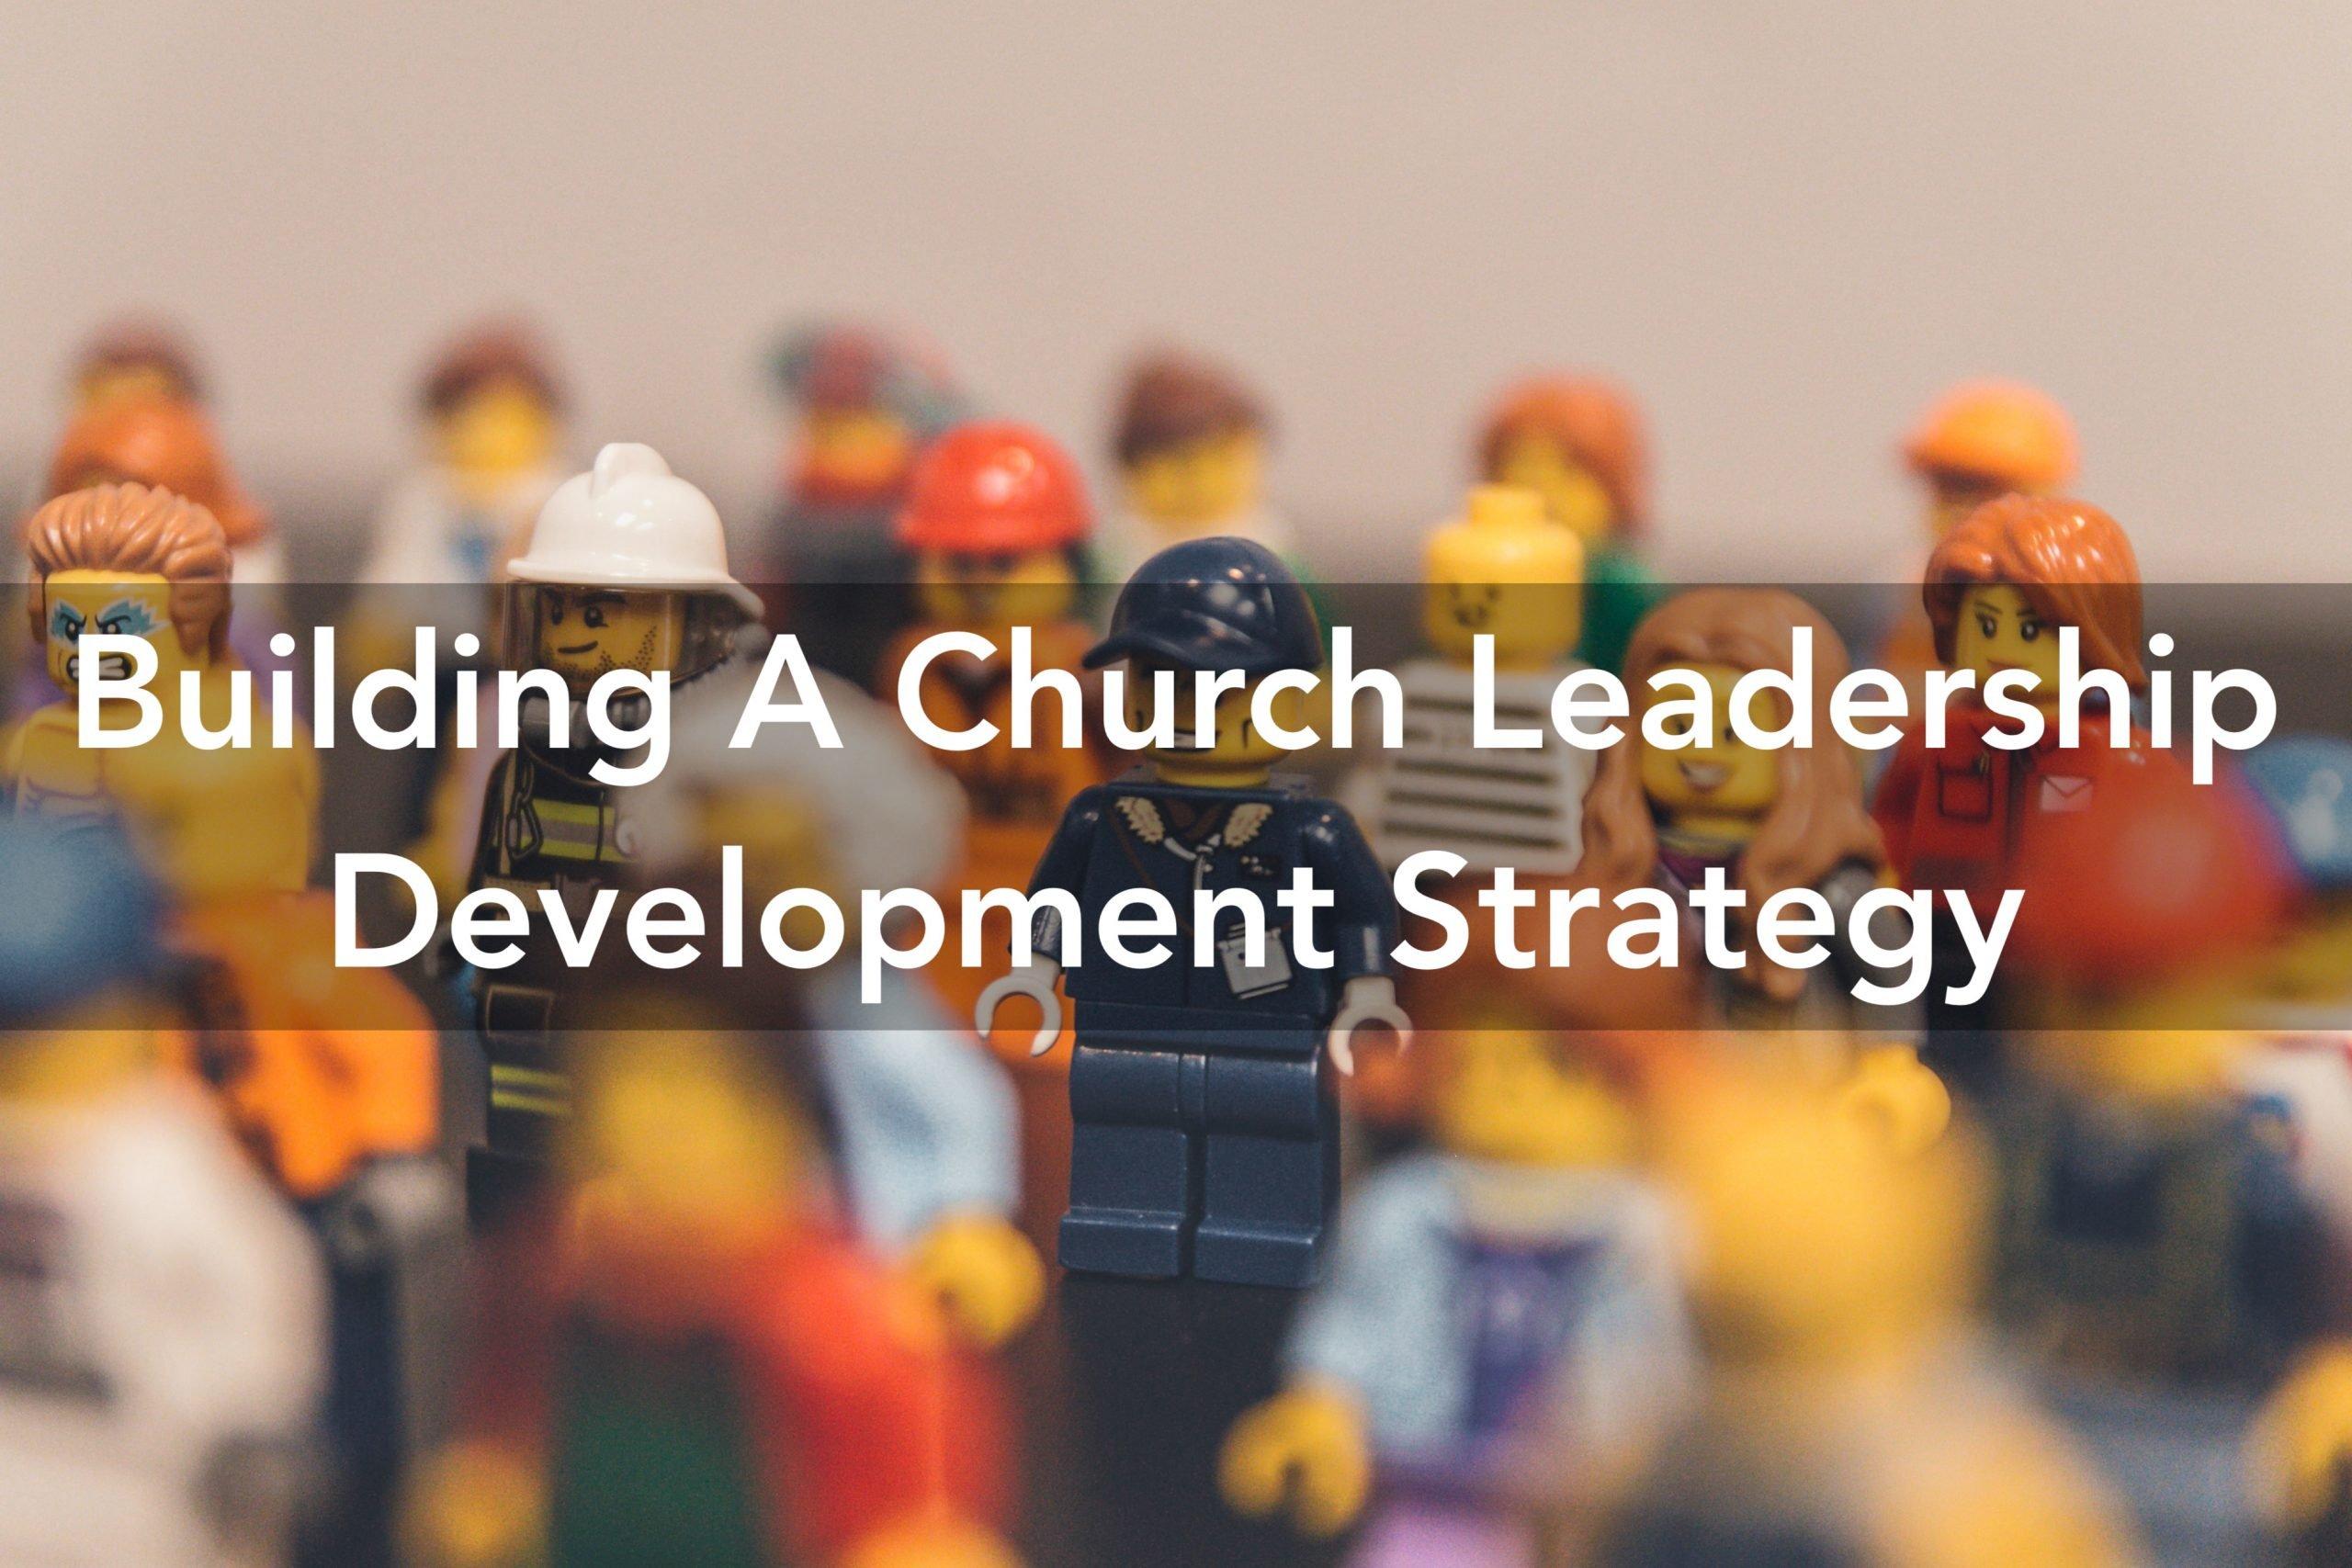 Building A Church Leadership Development Strategy